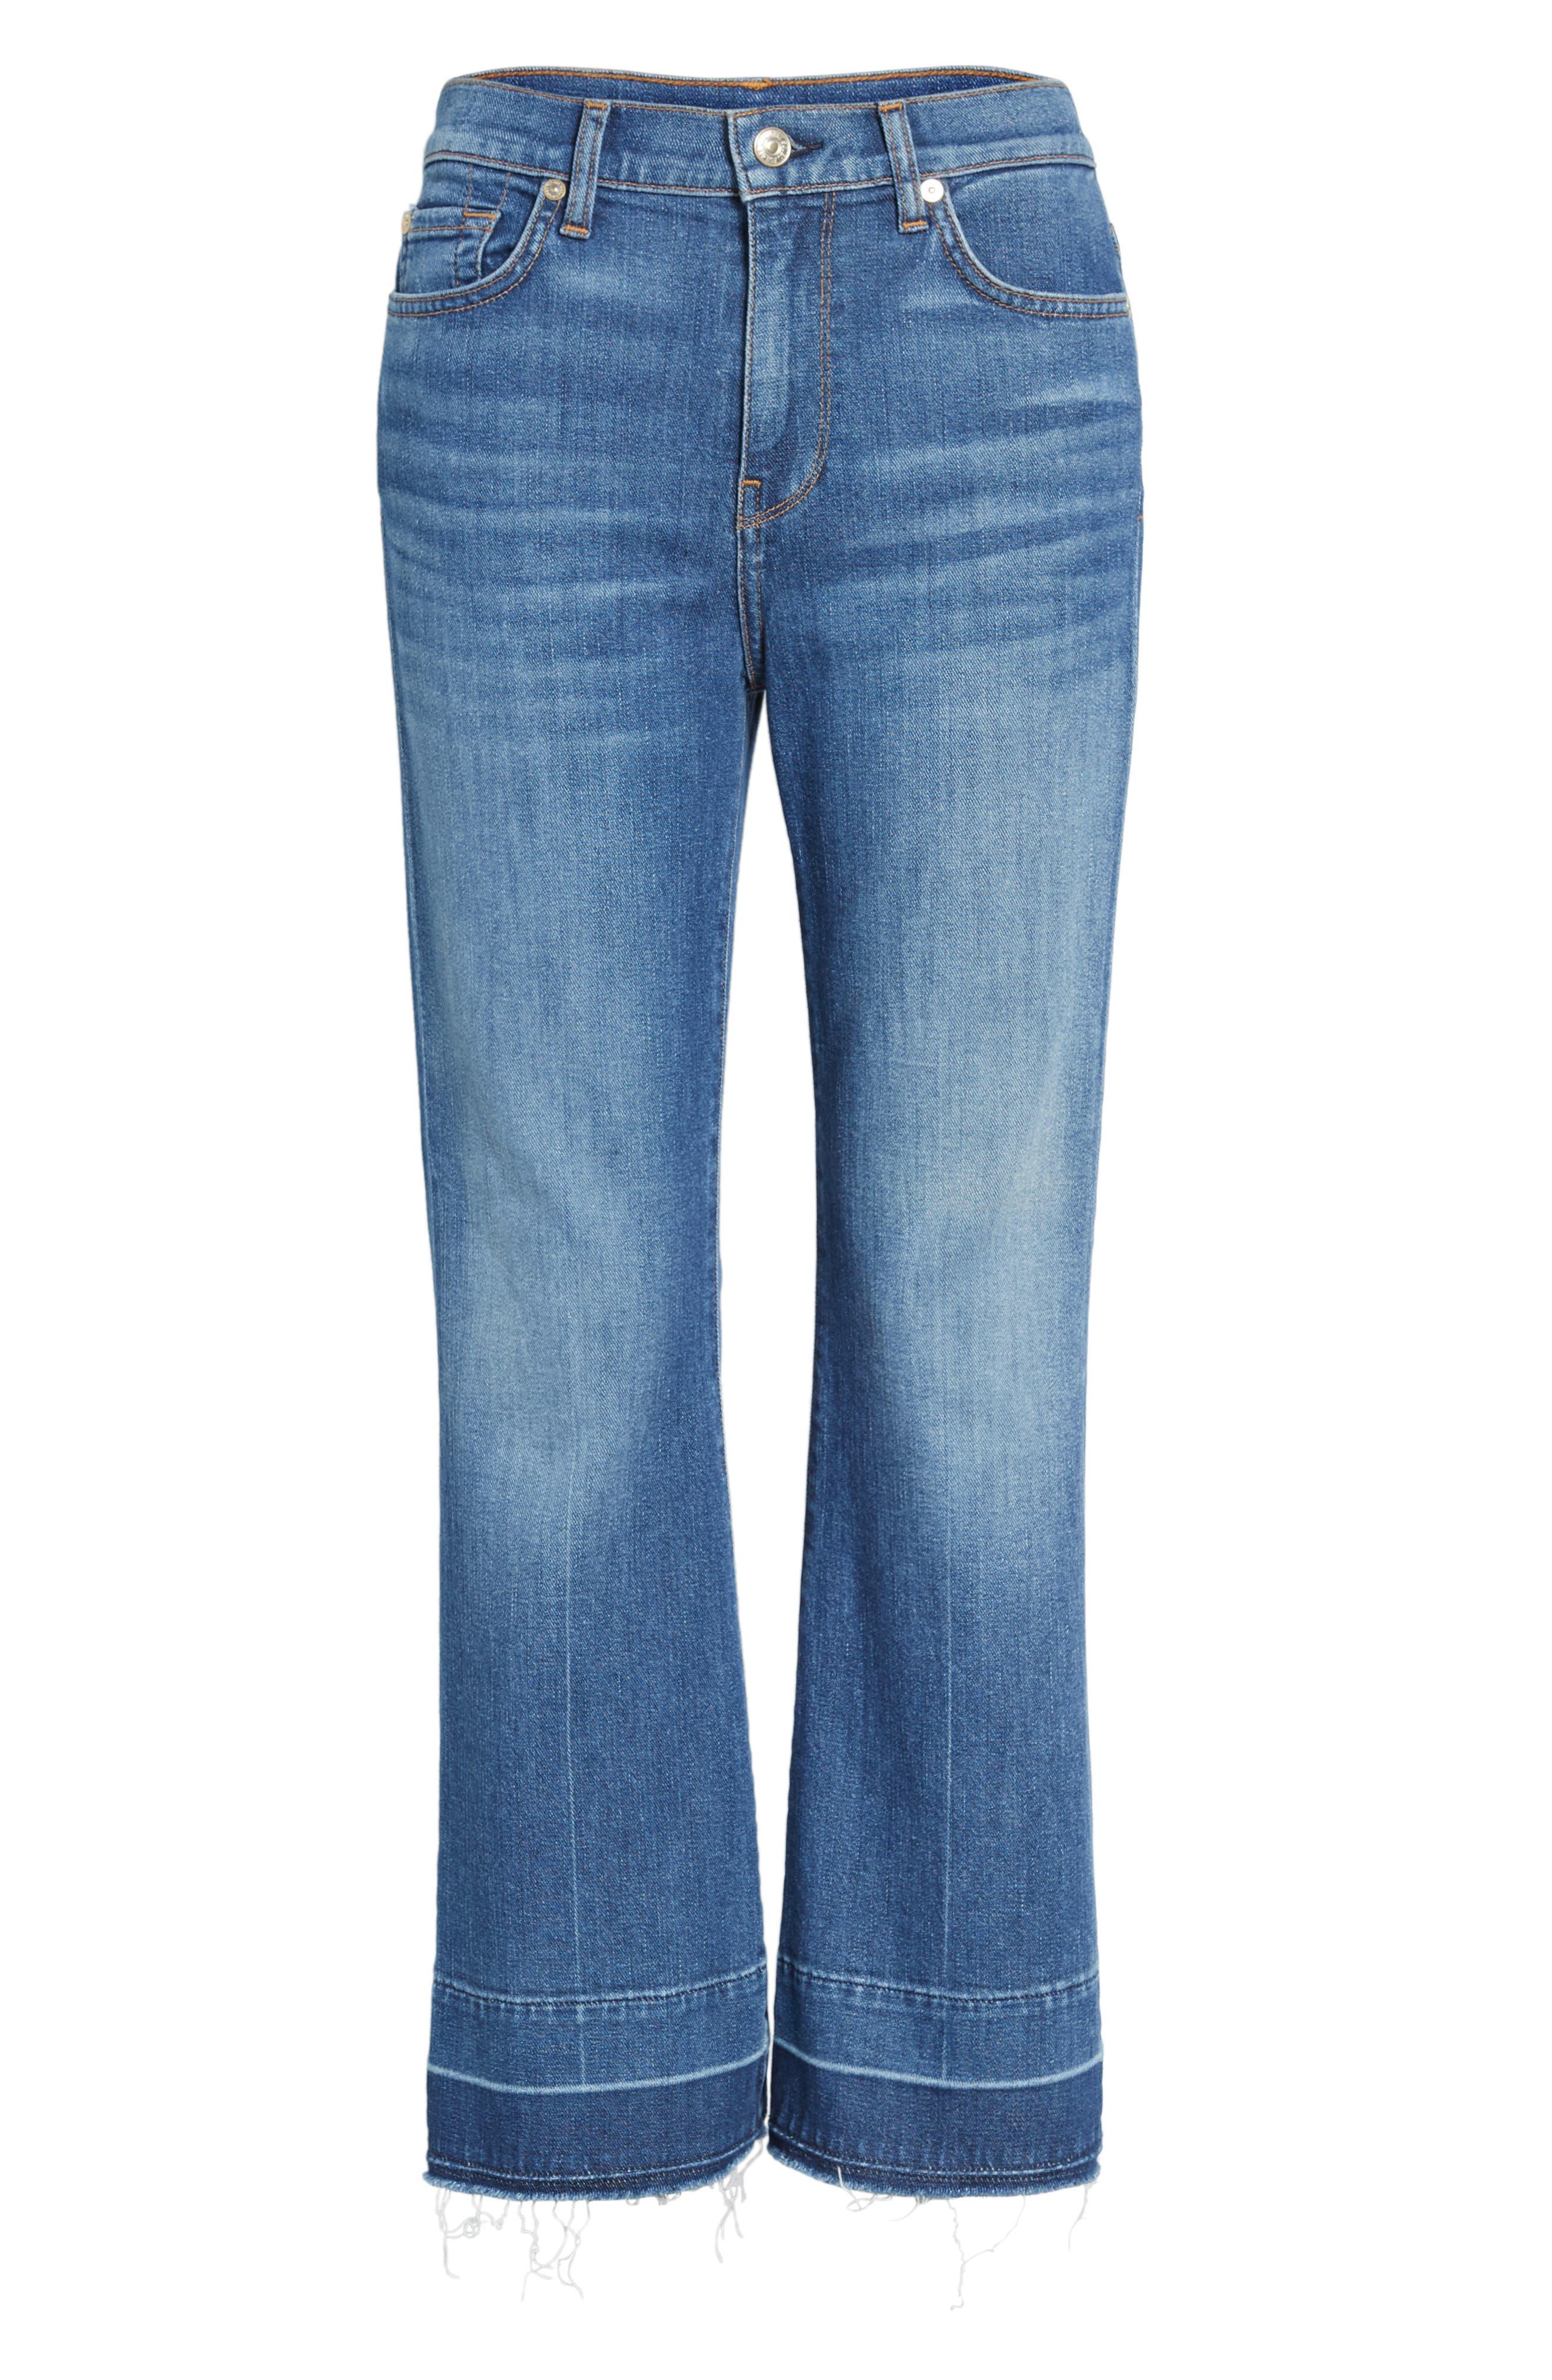 7 FOR ALL MANKIND<SUP>®</SUP>, Ali Split Hem Crop Flare Jeans, Alternate thumbnail 6, color, 401